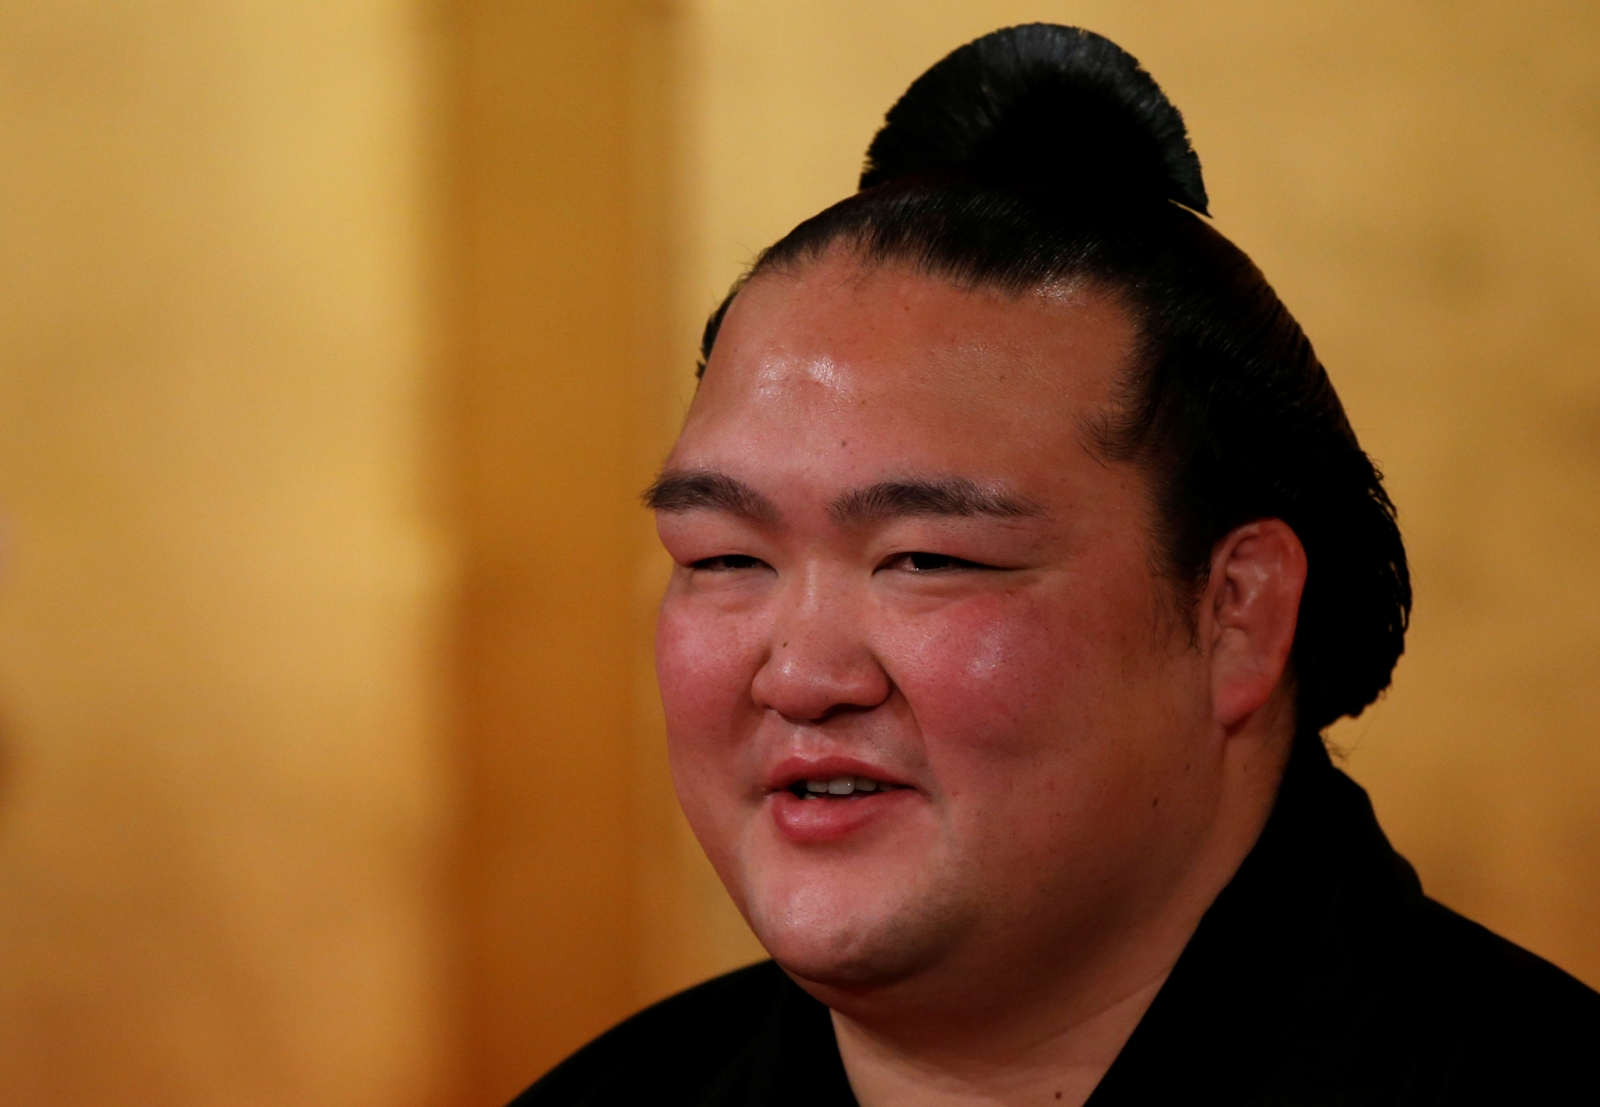 Japanese sumo wrestler Kisenosato